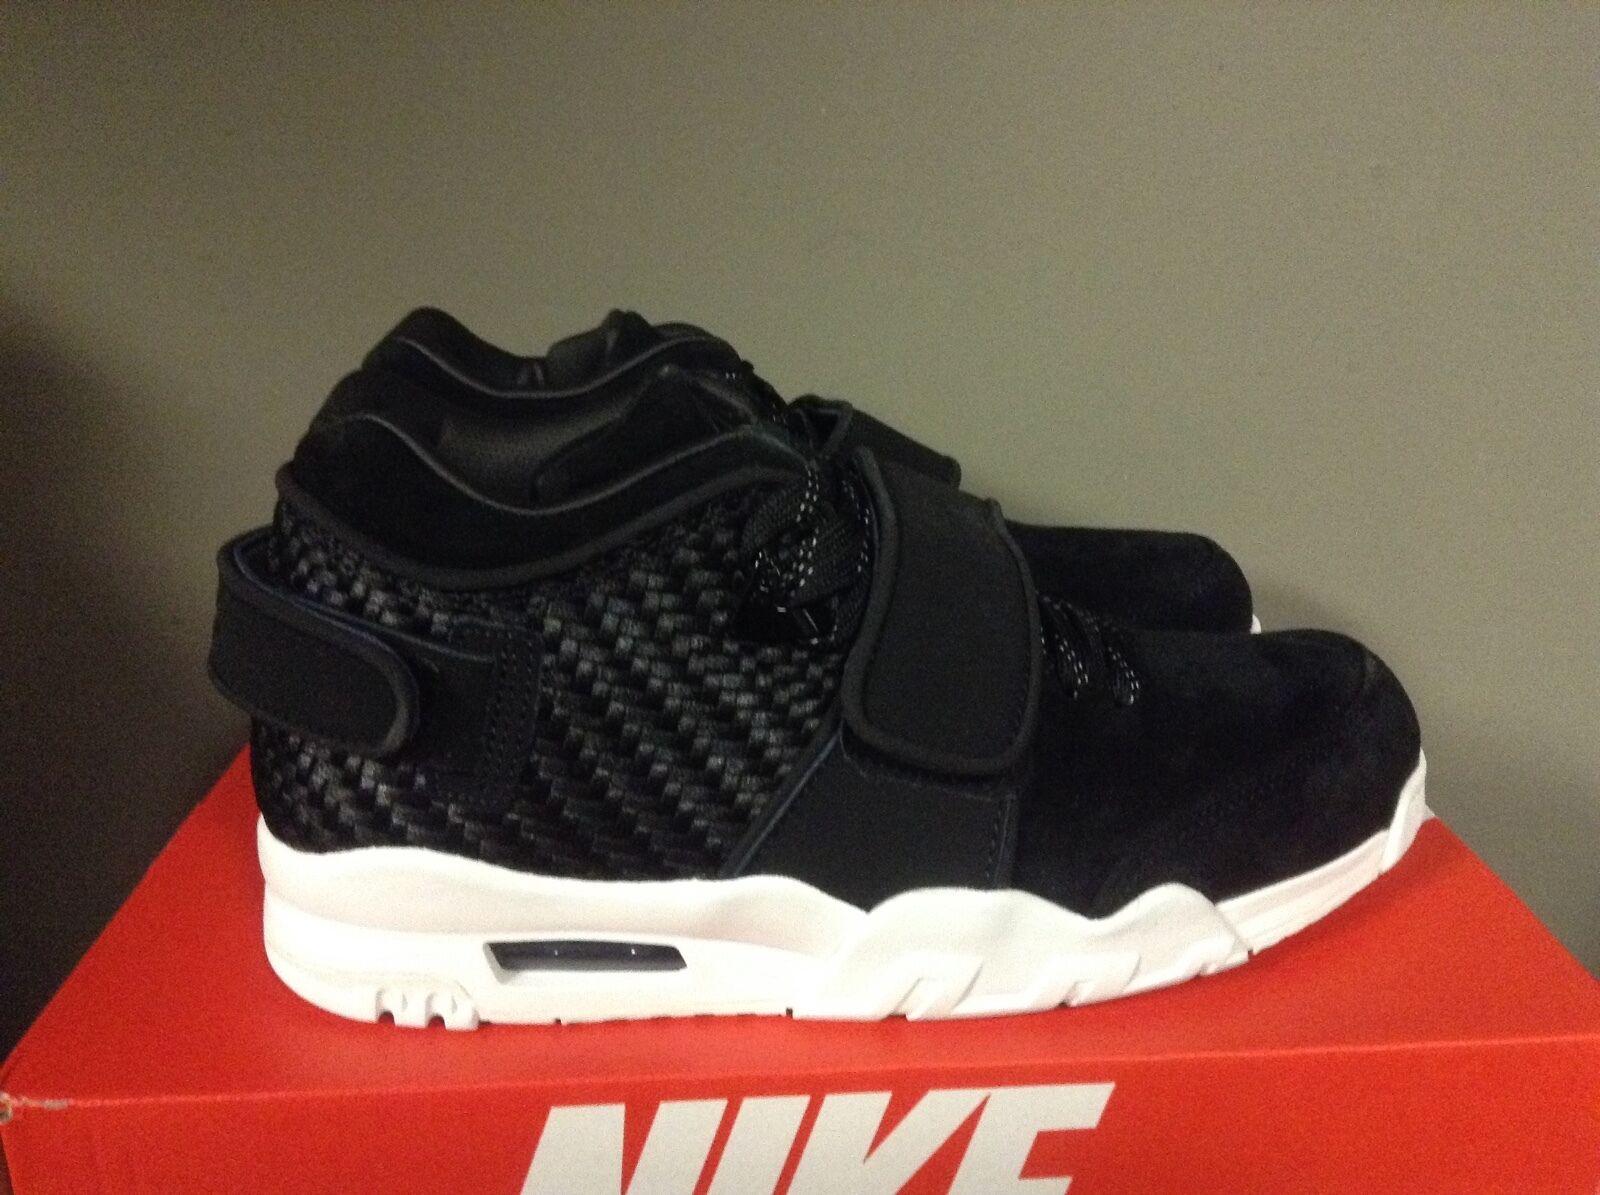 Nike air allenatore victor cruz bianco uomini 777535-004 nero / bianco cruz * nuove scarpe. d0c6bf